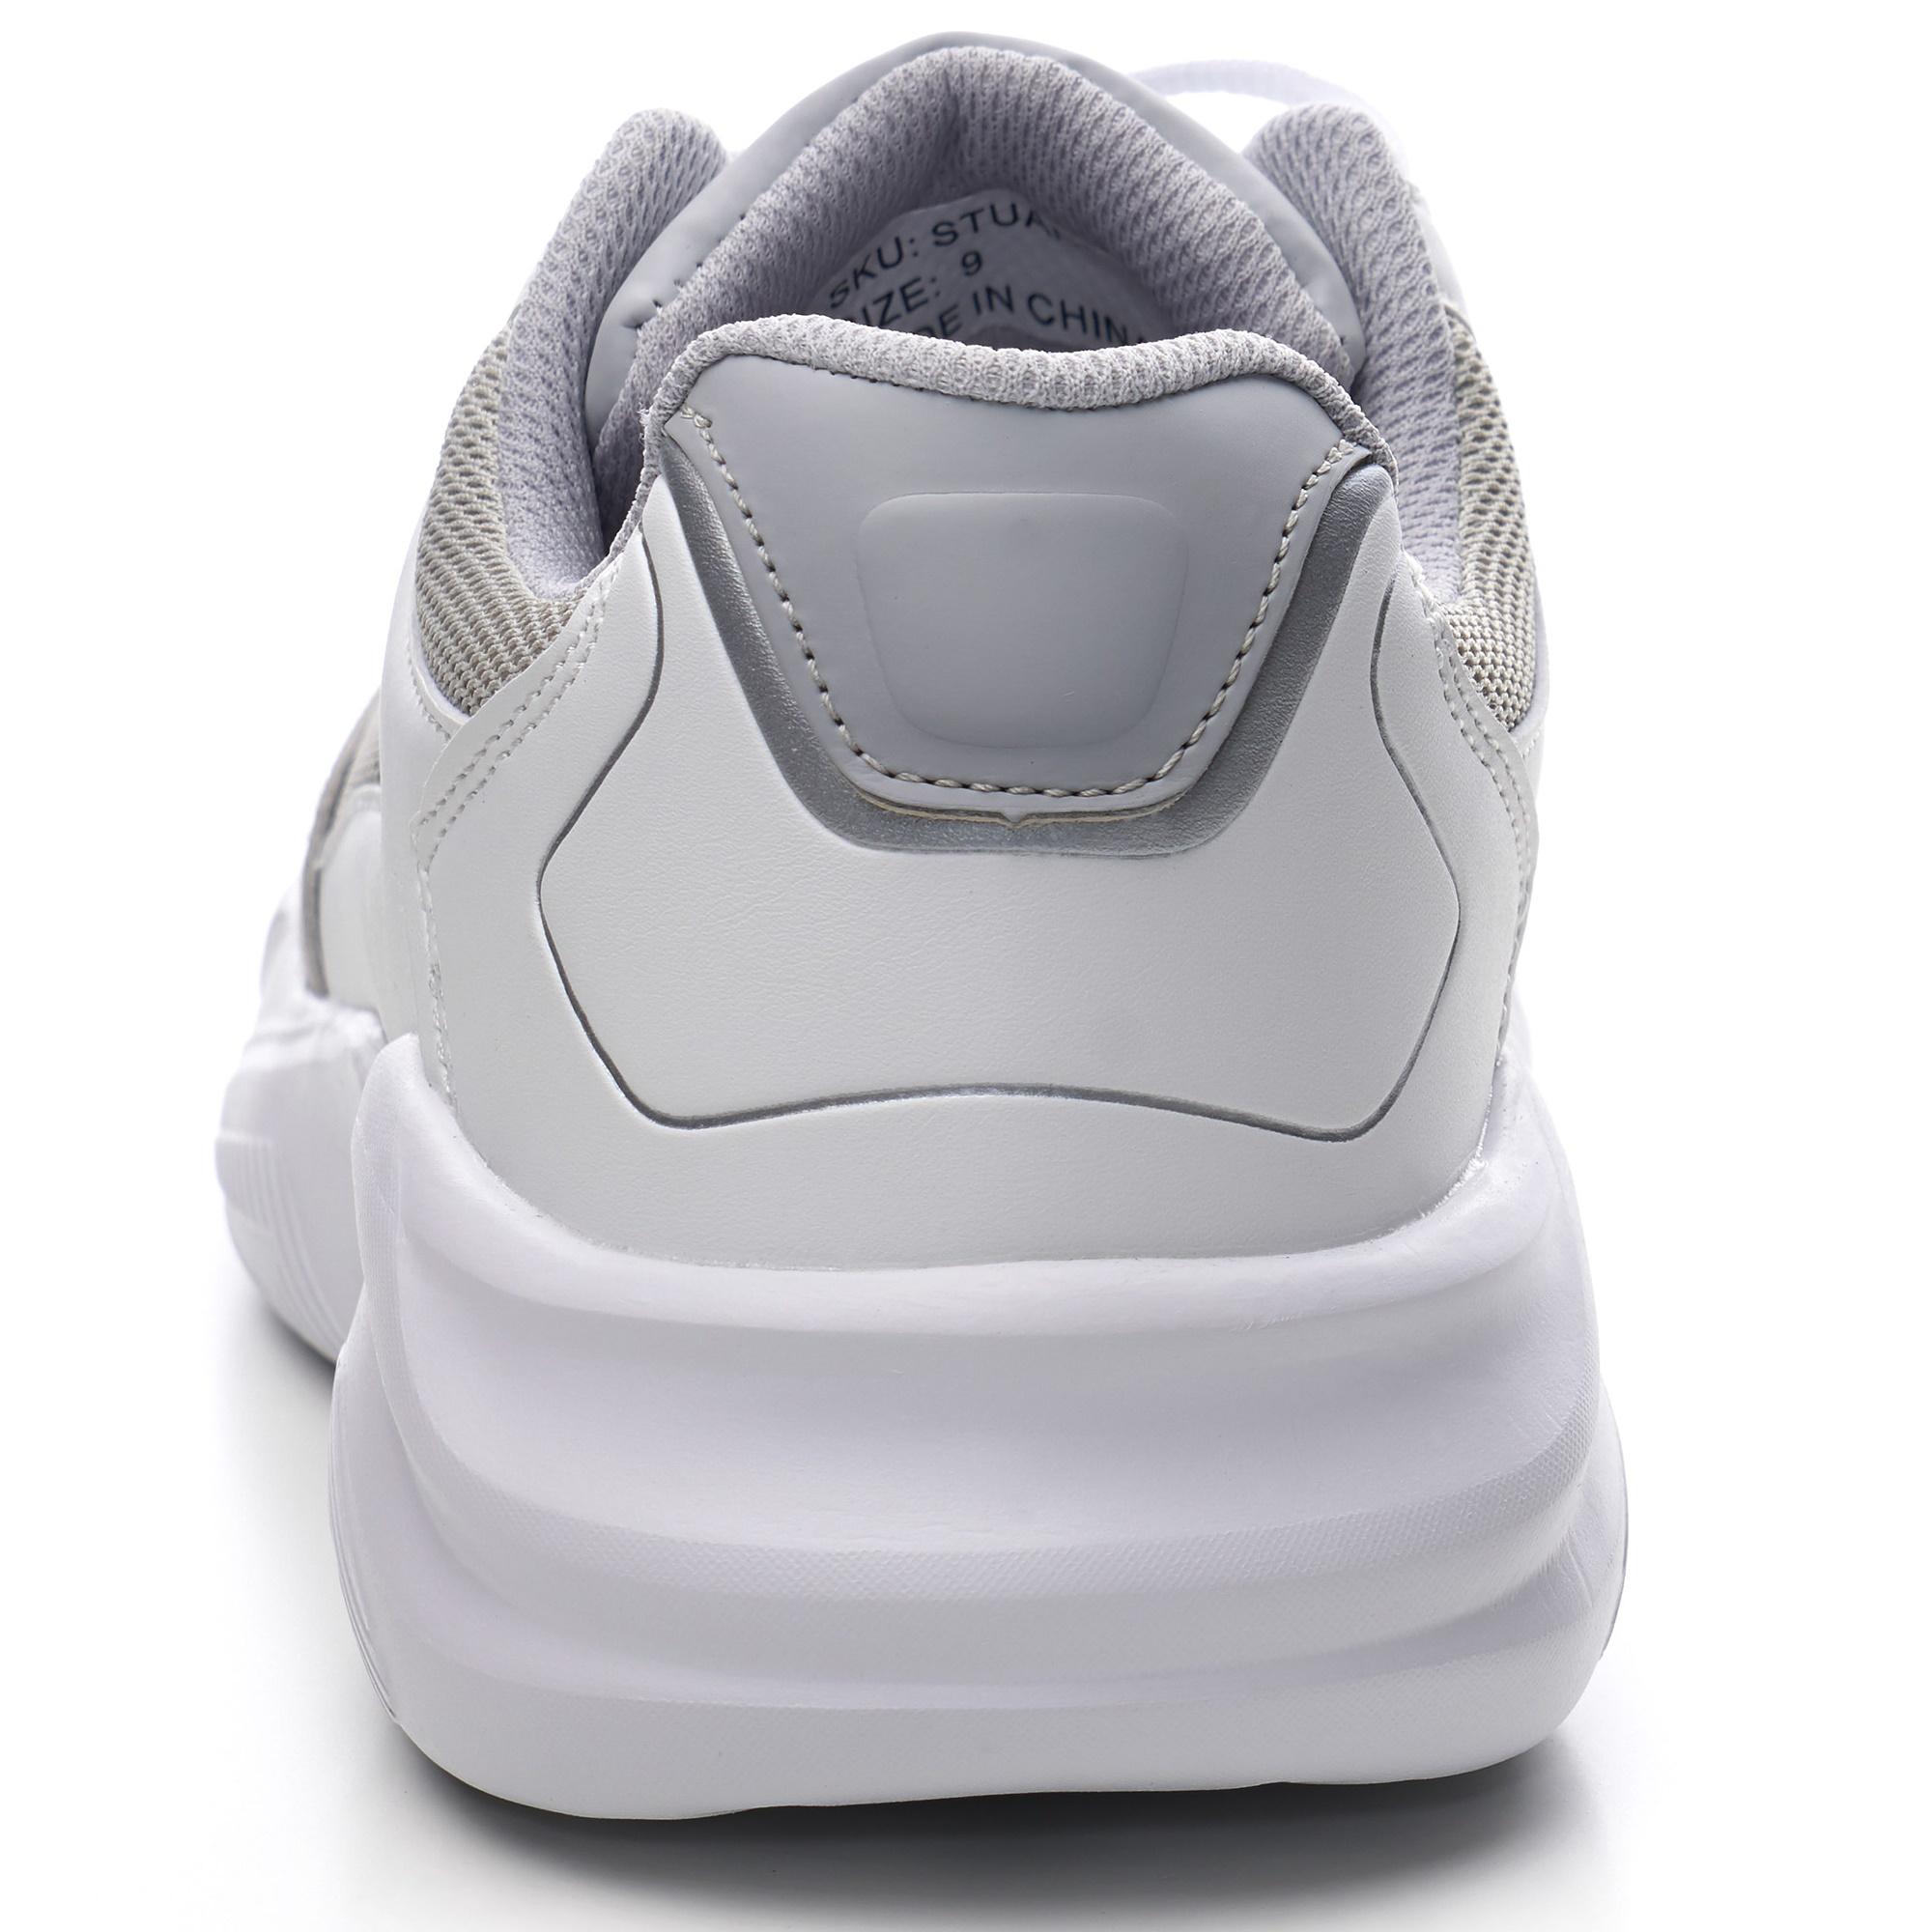 Alpine-Swiss-Stuart-Mens-Chunky-Sneakers-Retro-Platform-Dad-Tennis-Shoes thumbnail 41